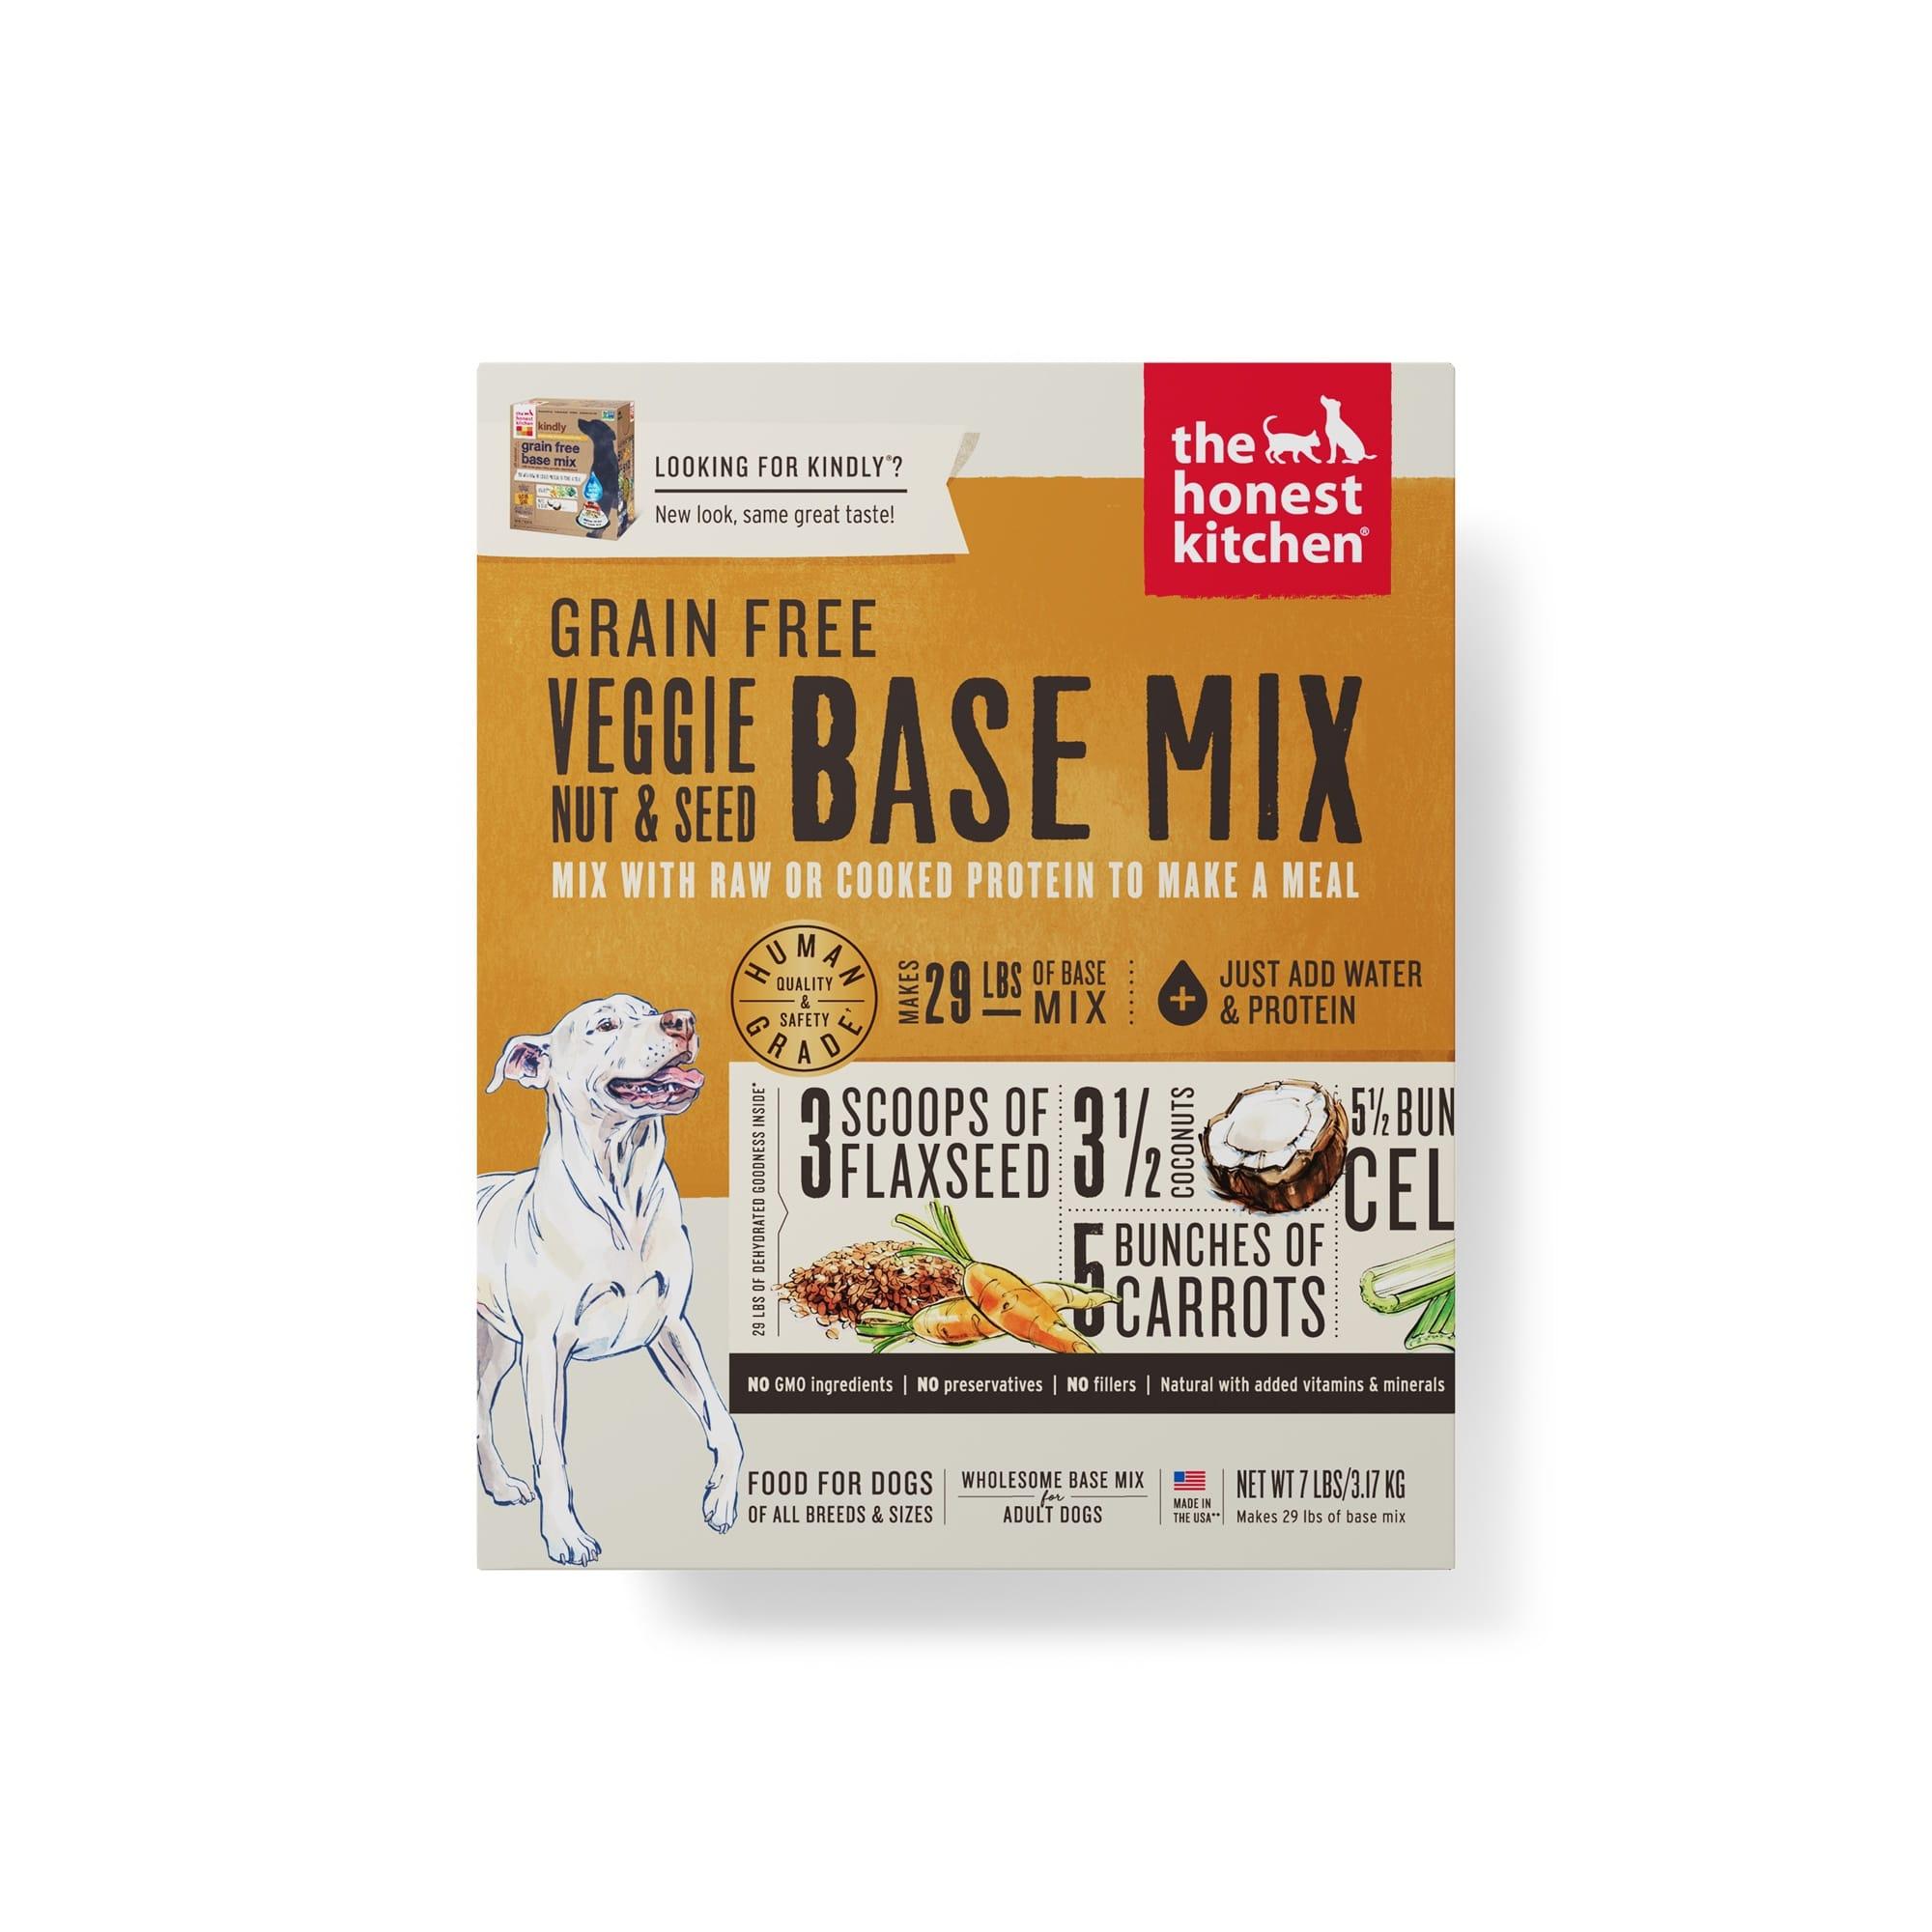 DEHYDRATED-VEGGIES-NUTS-BASE-MIX